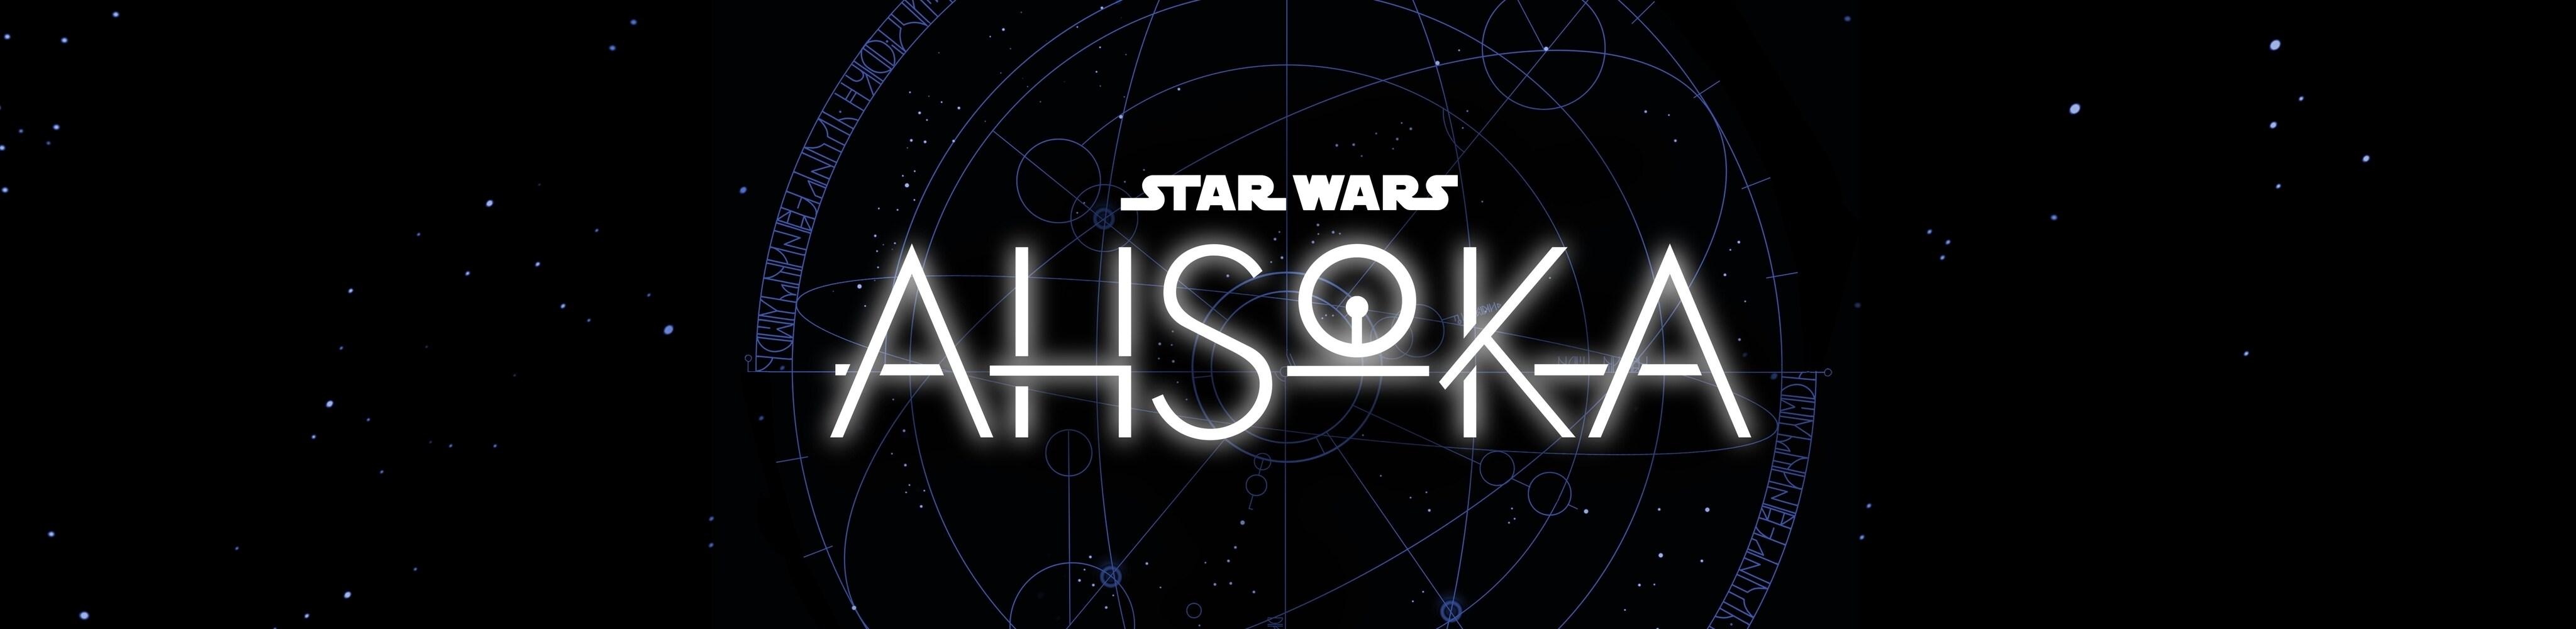 Star Wars | Ahsoka